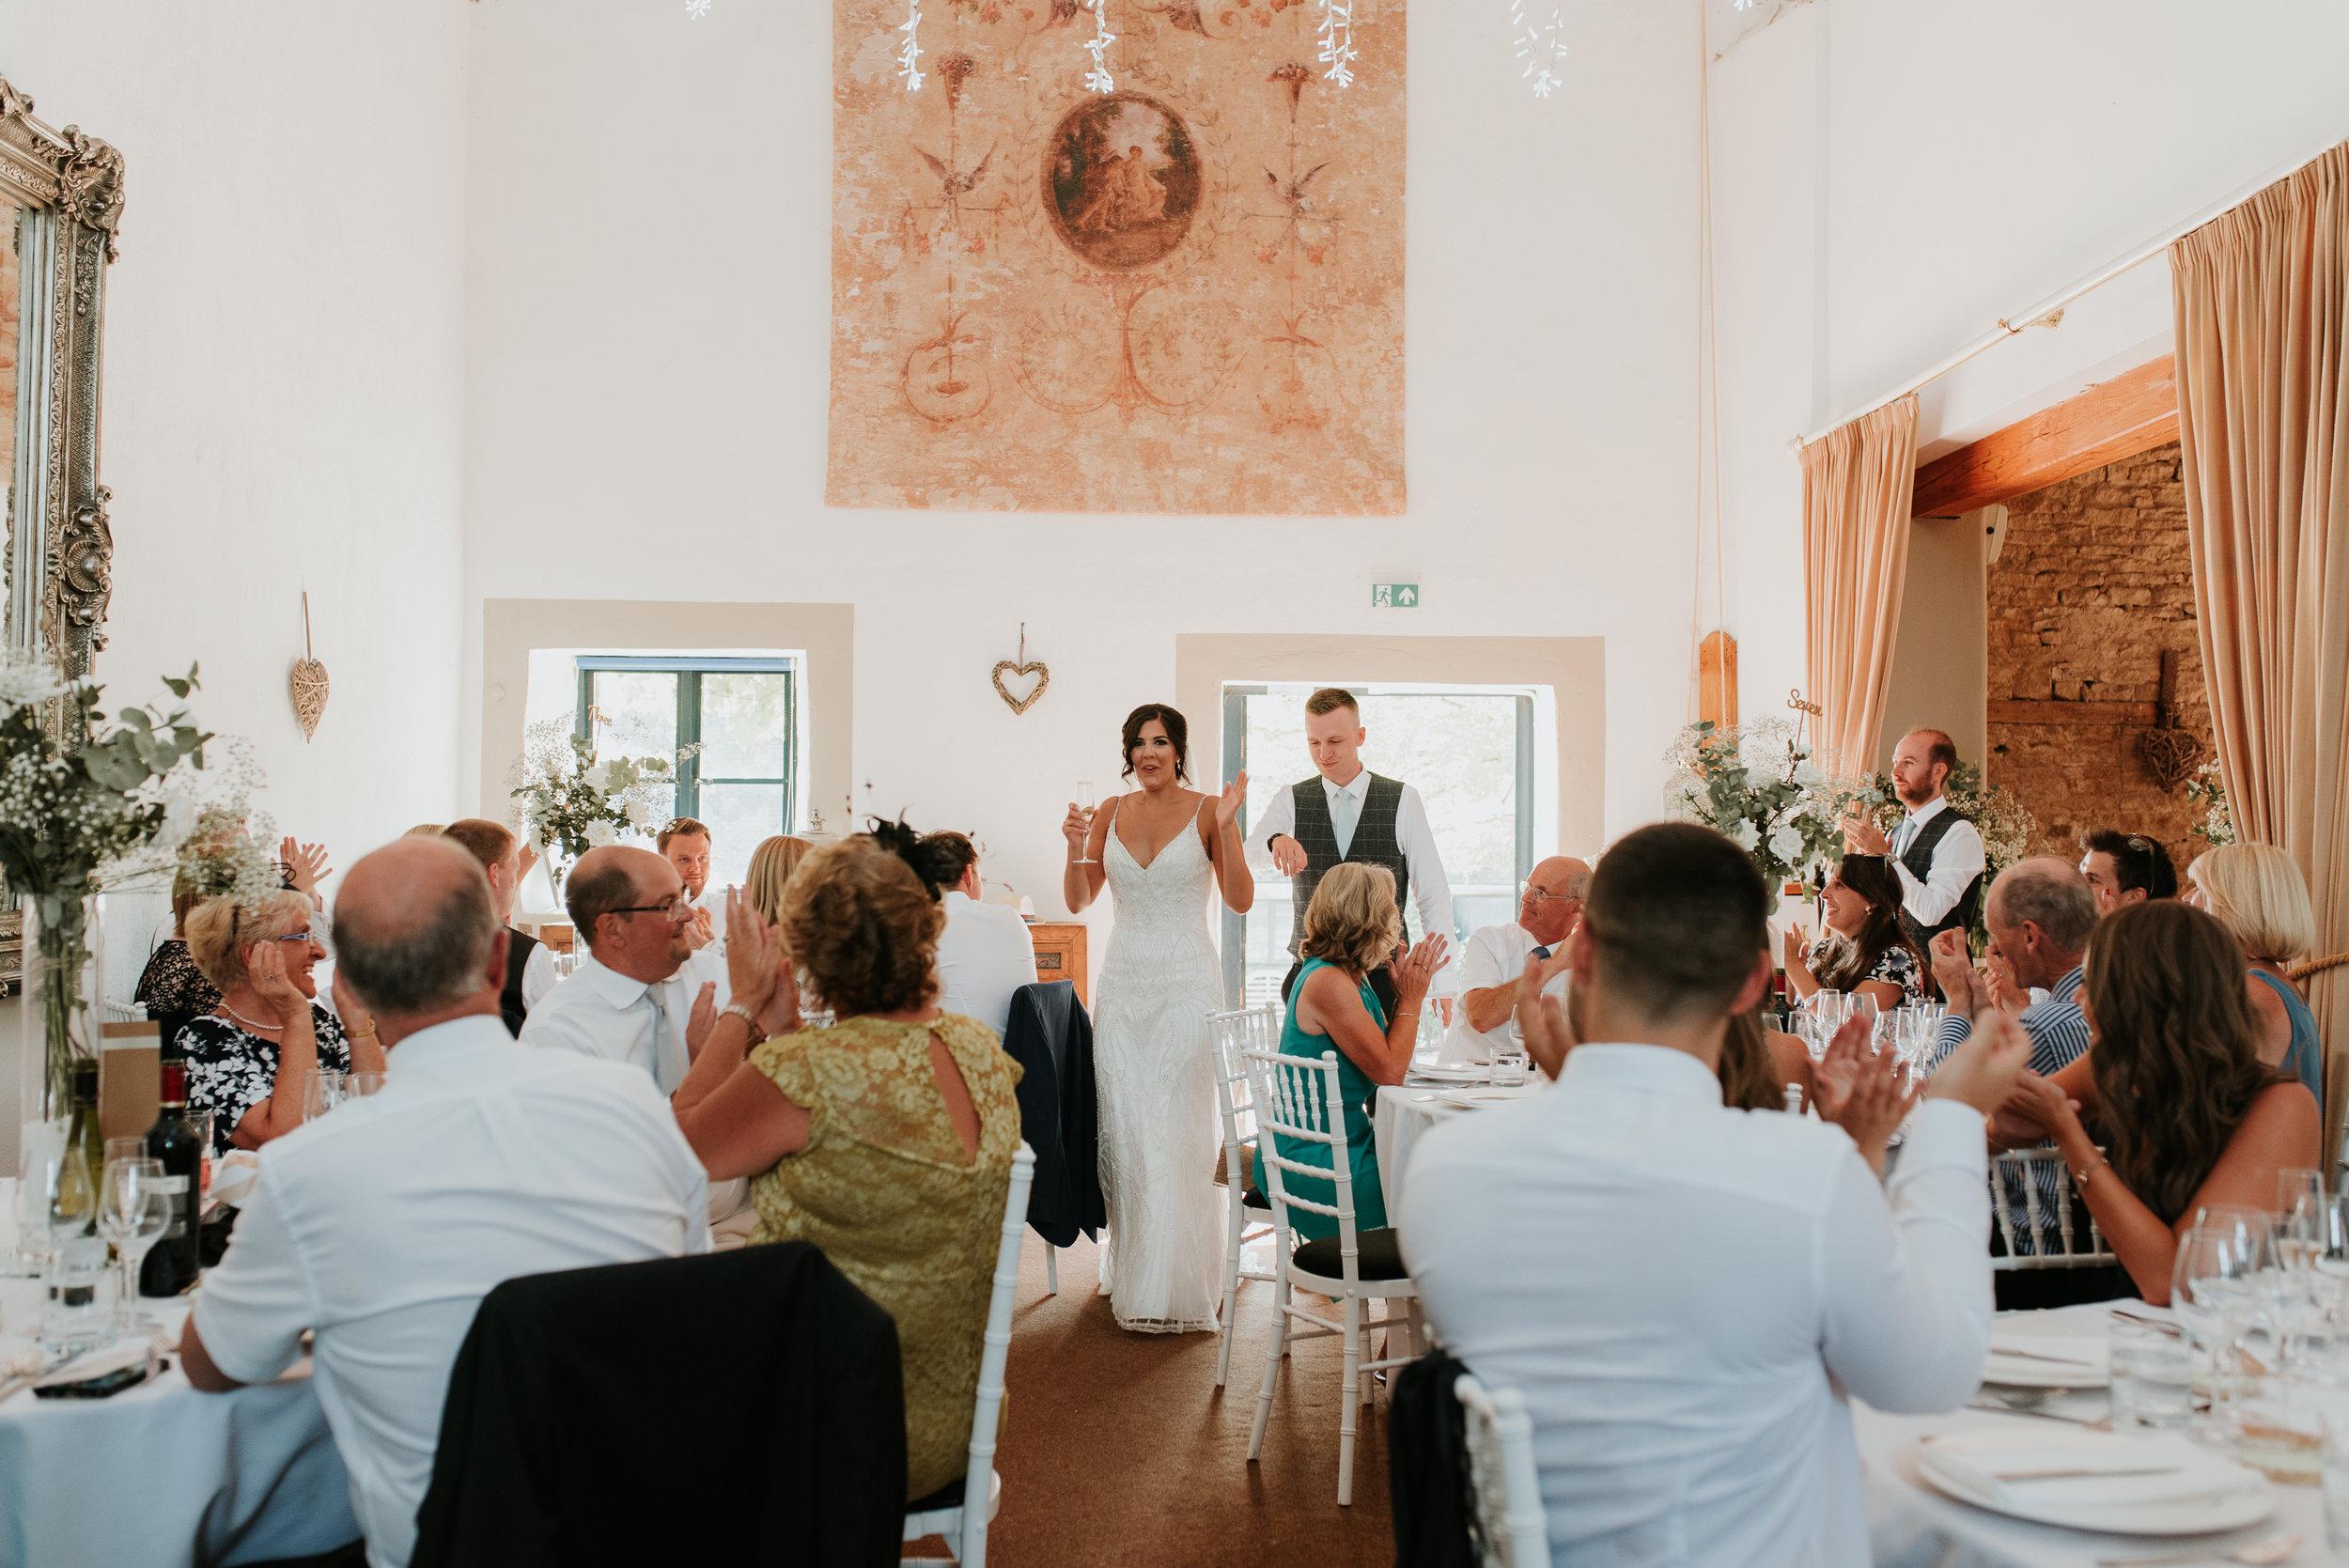 Oxfordshire-wedding-photographer-61.jpg